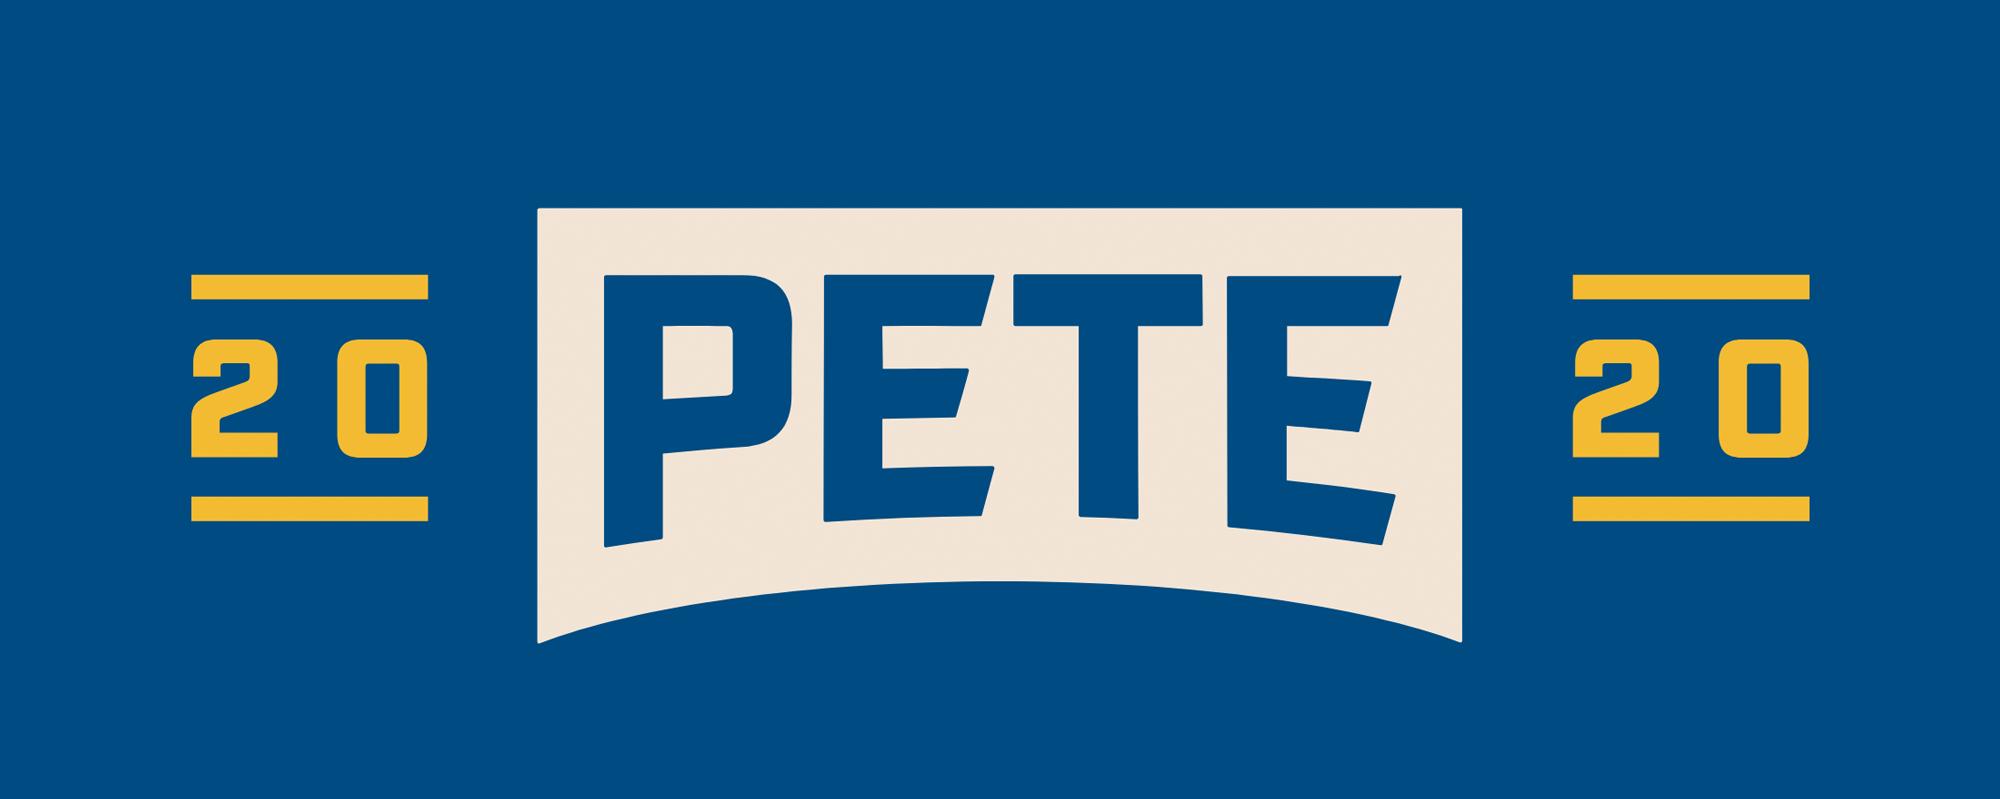 pete_buttigieg_logo.png